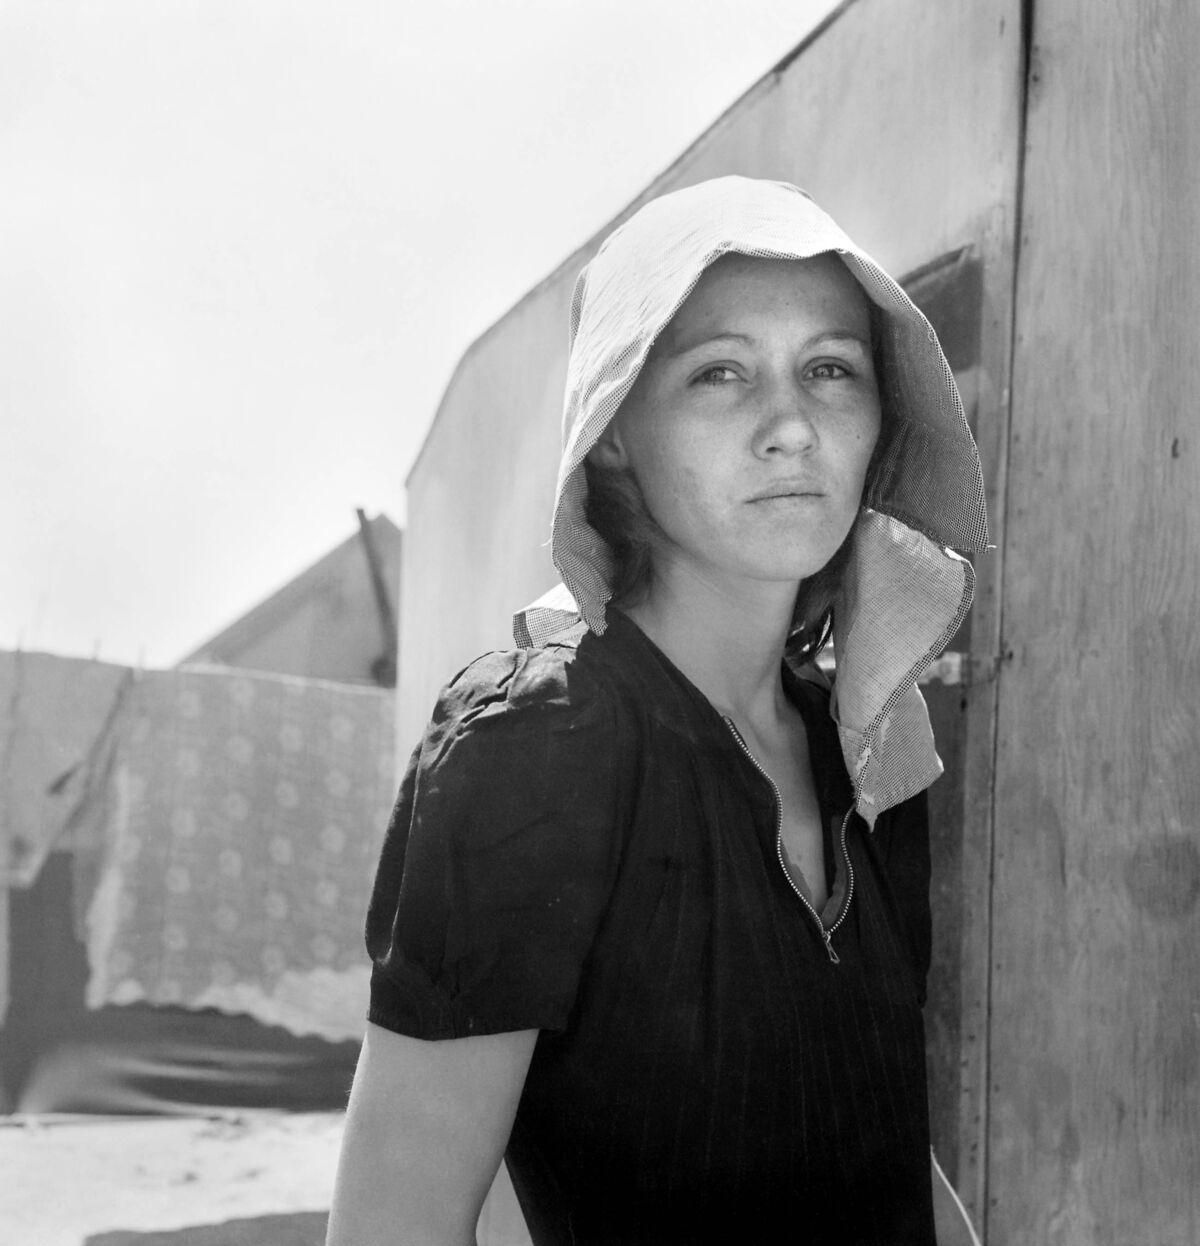 Dorothea Lange, Edison, Kern County, California, 1940. Image via Wikimedia Commons.